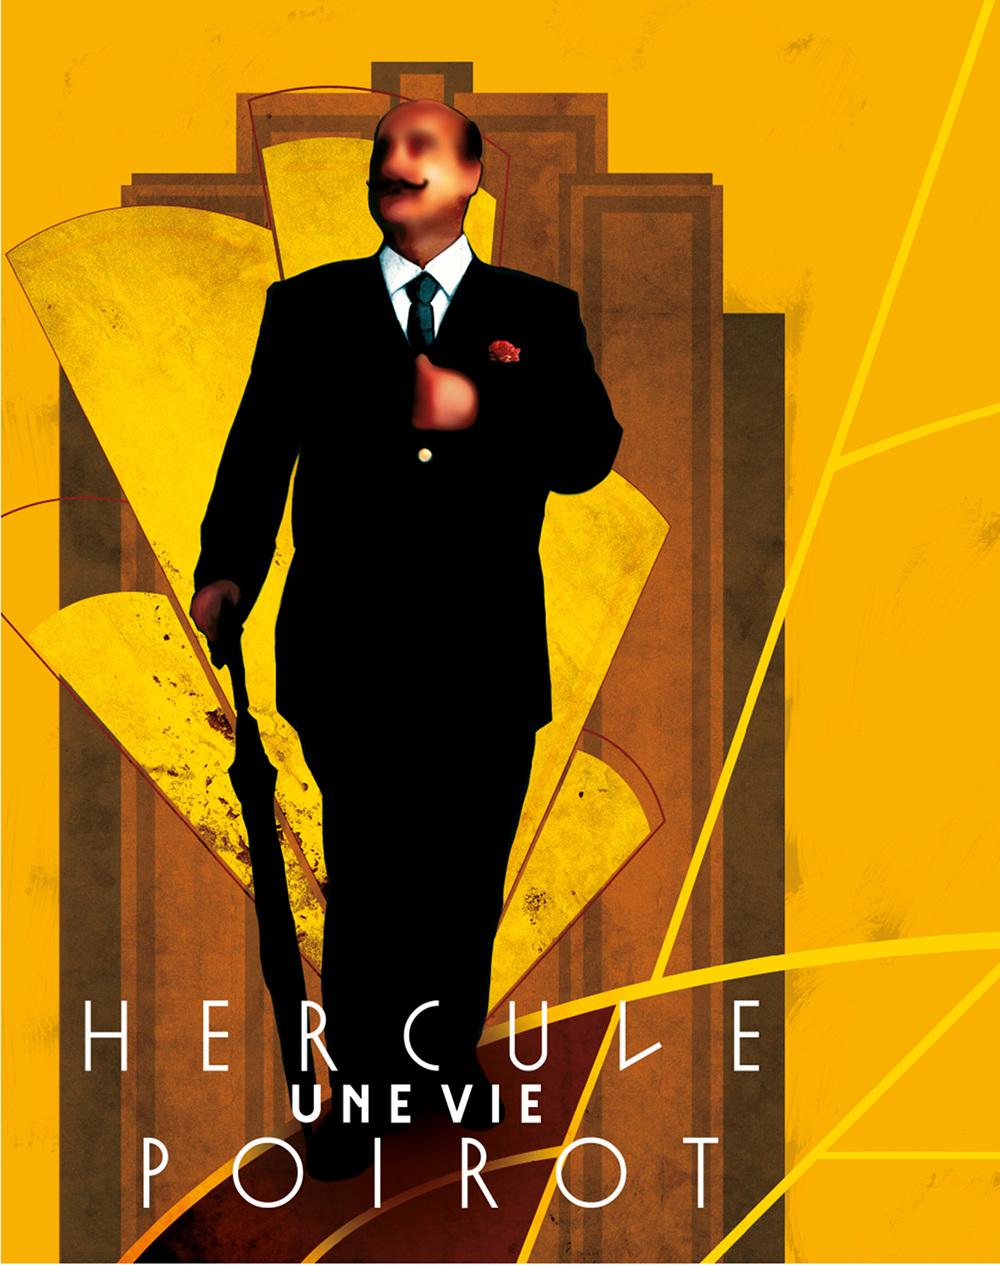 Hercule Poirot, une vie [EPUB]